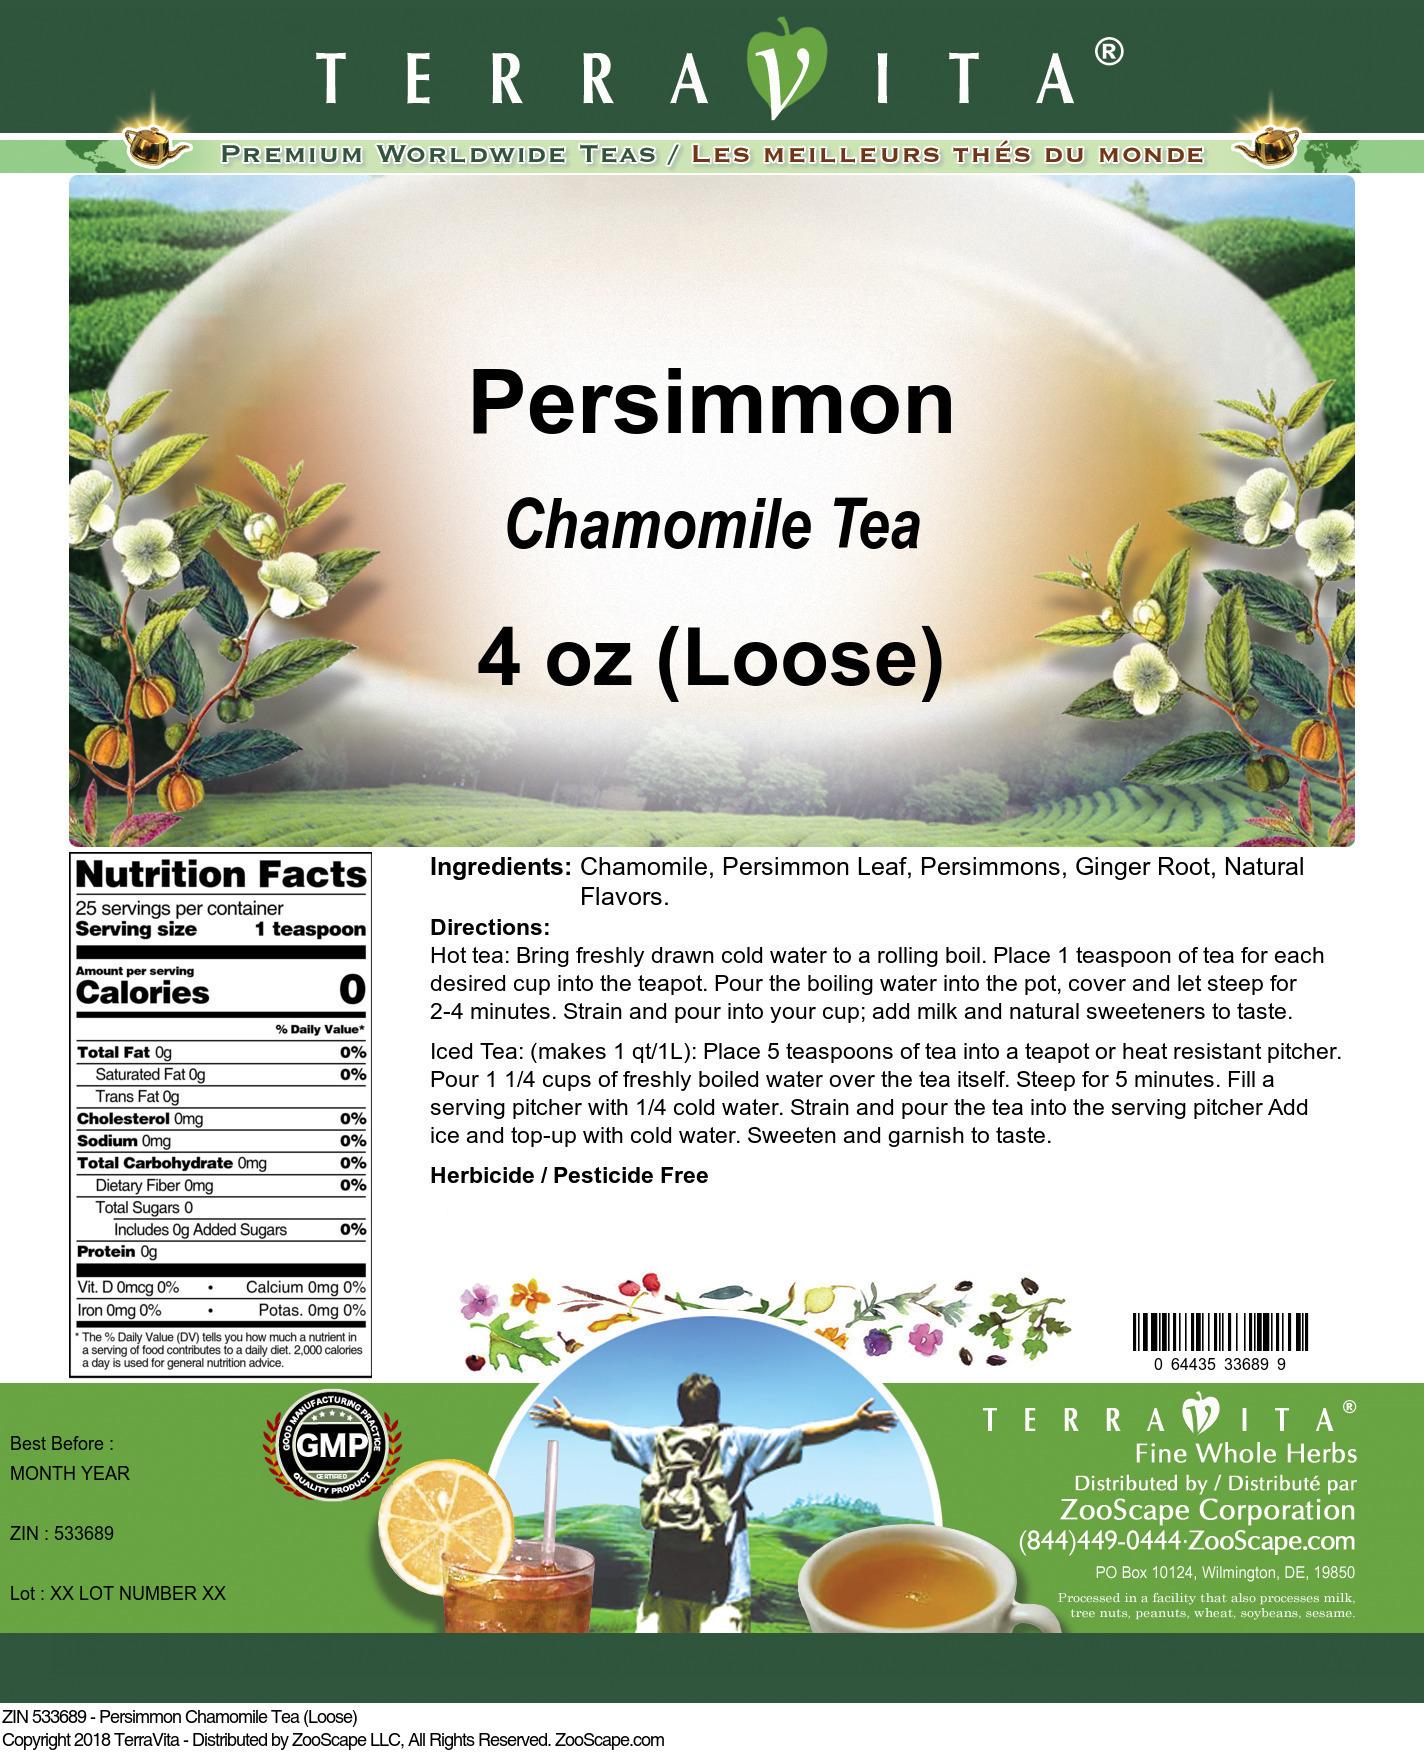 Persimmon Chamomile Tea